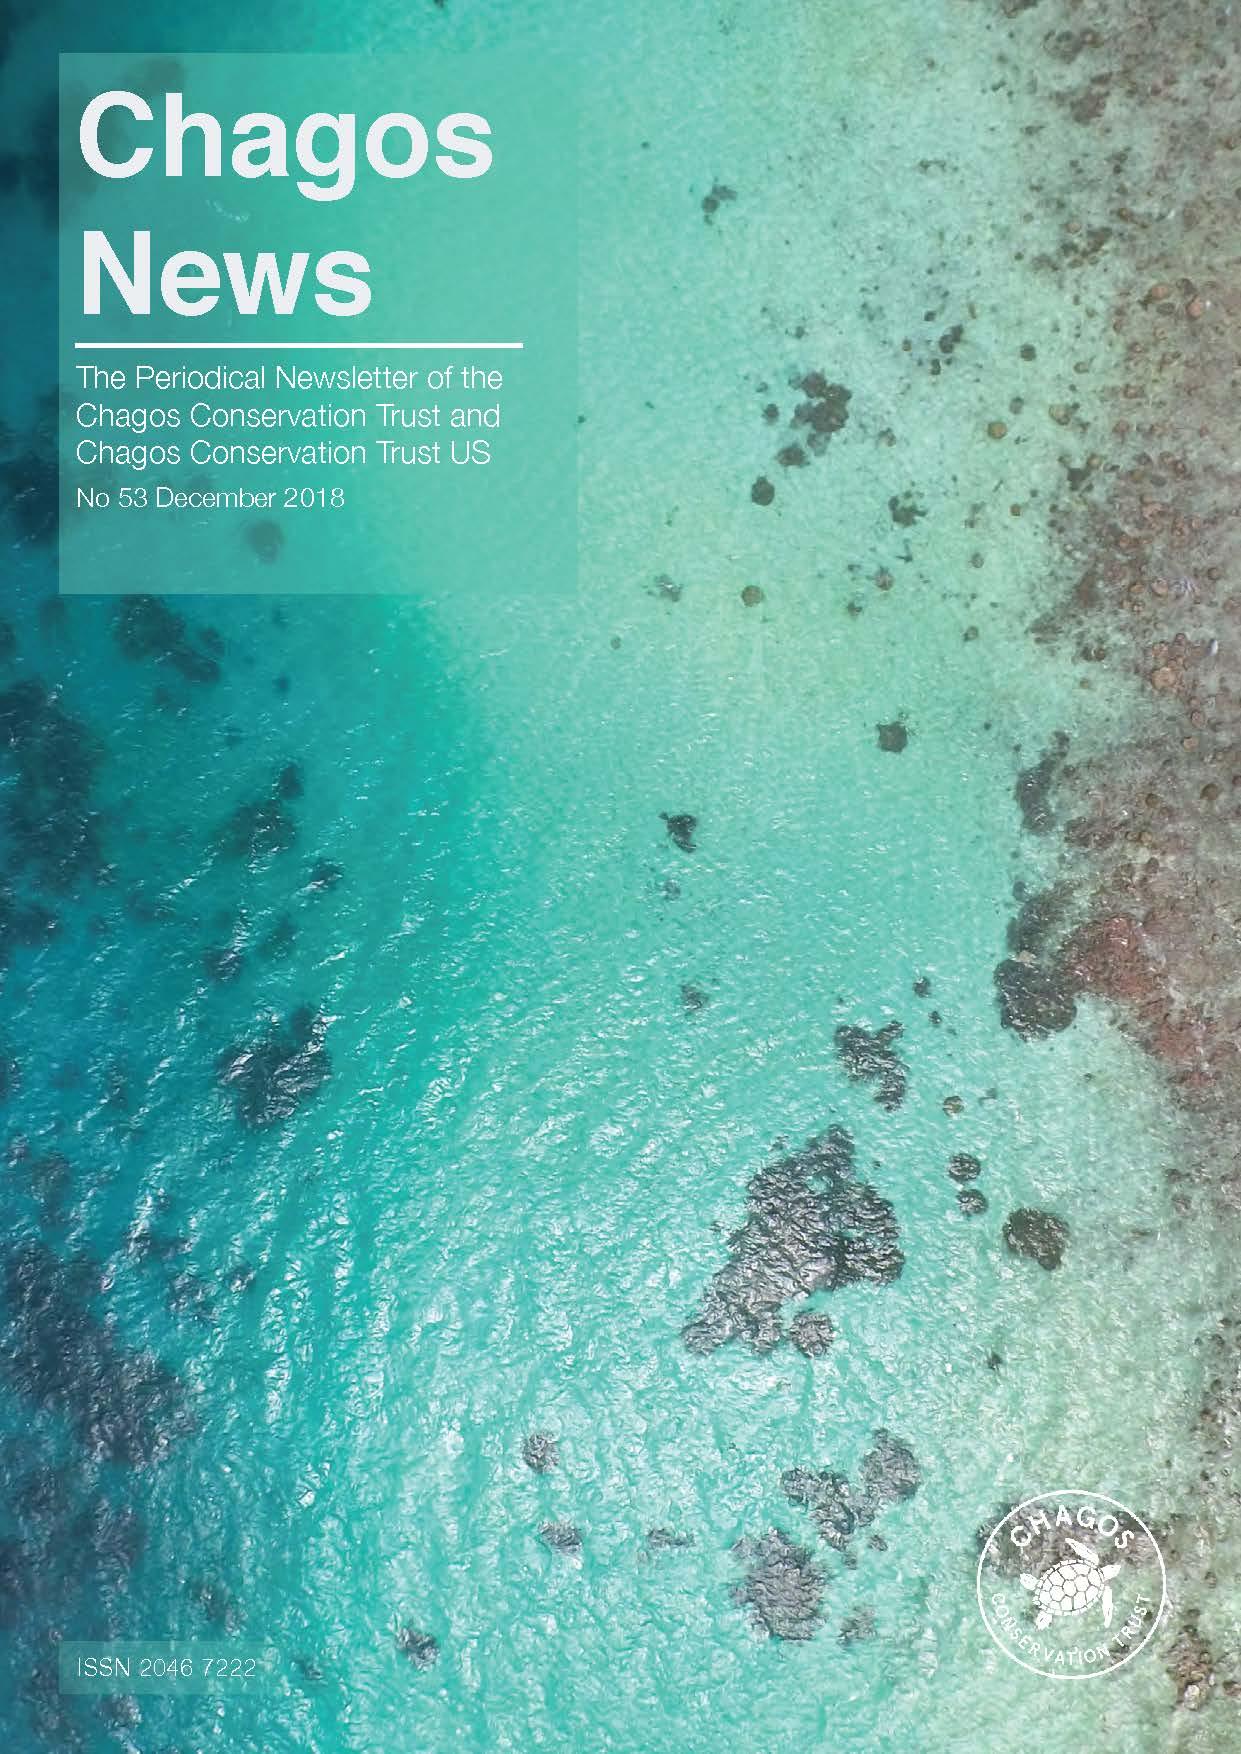 Chagos News issue #53